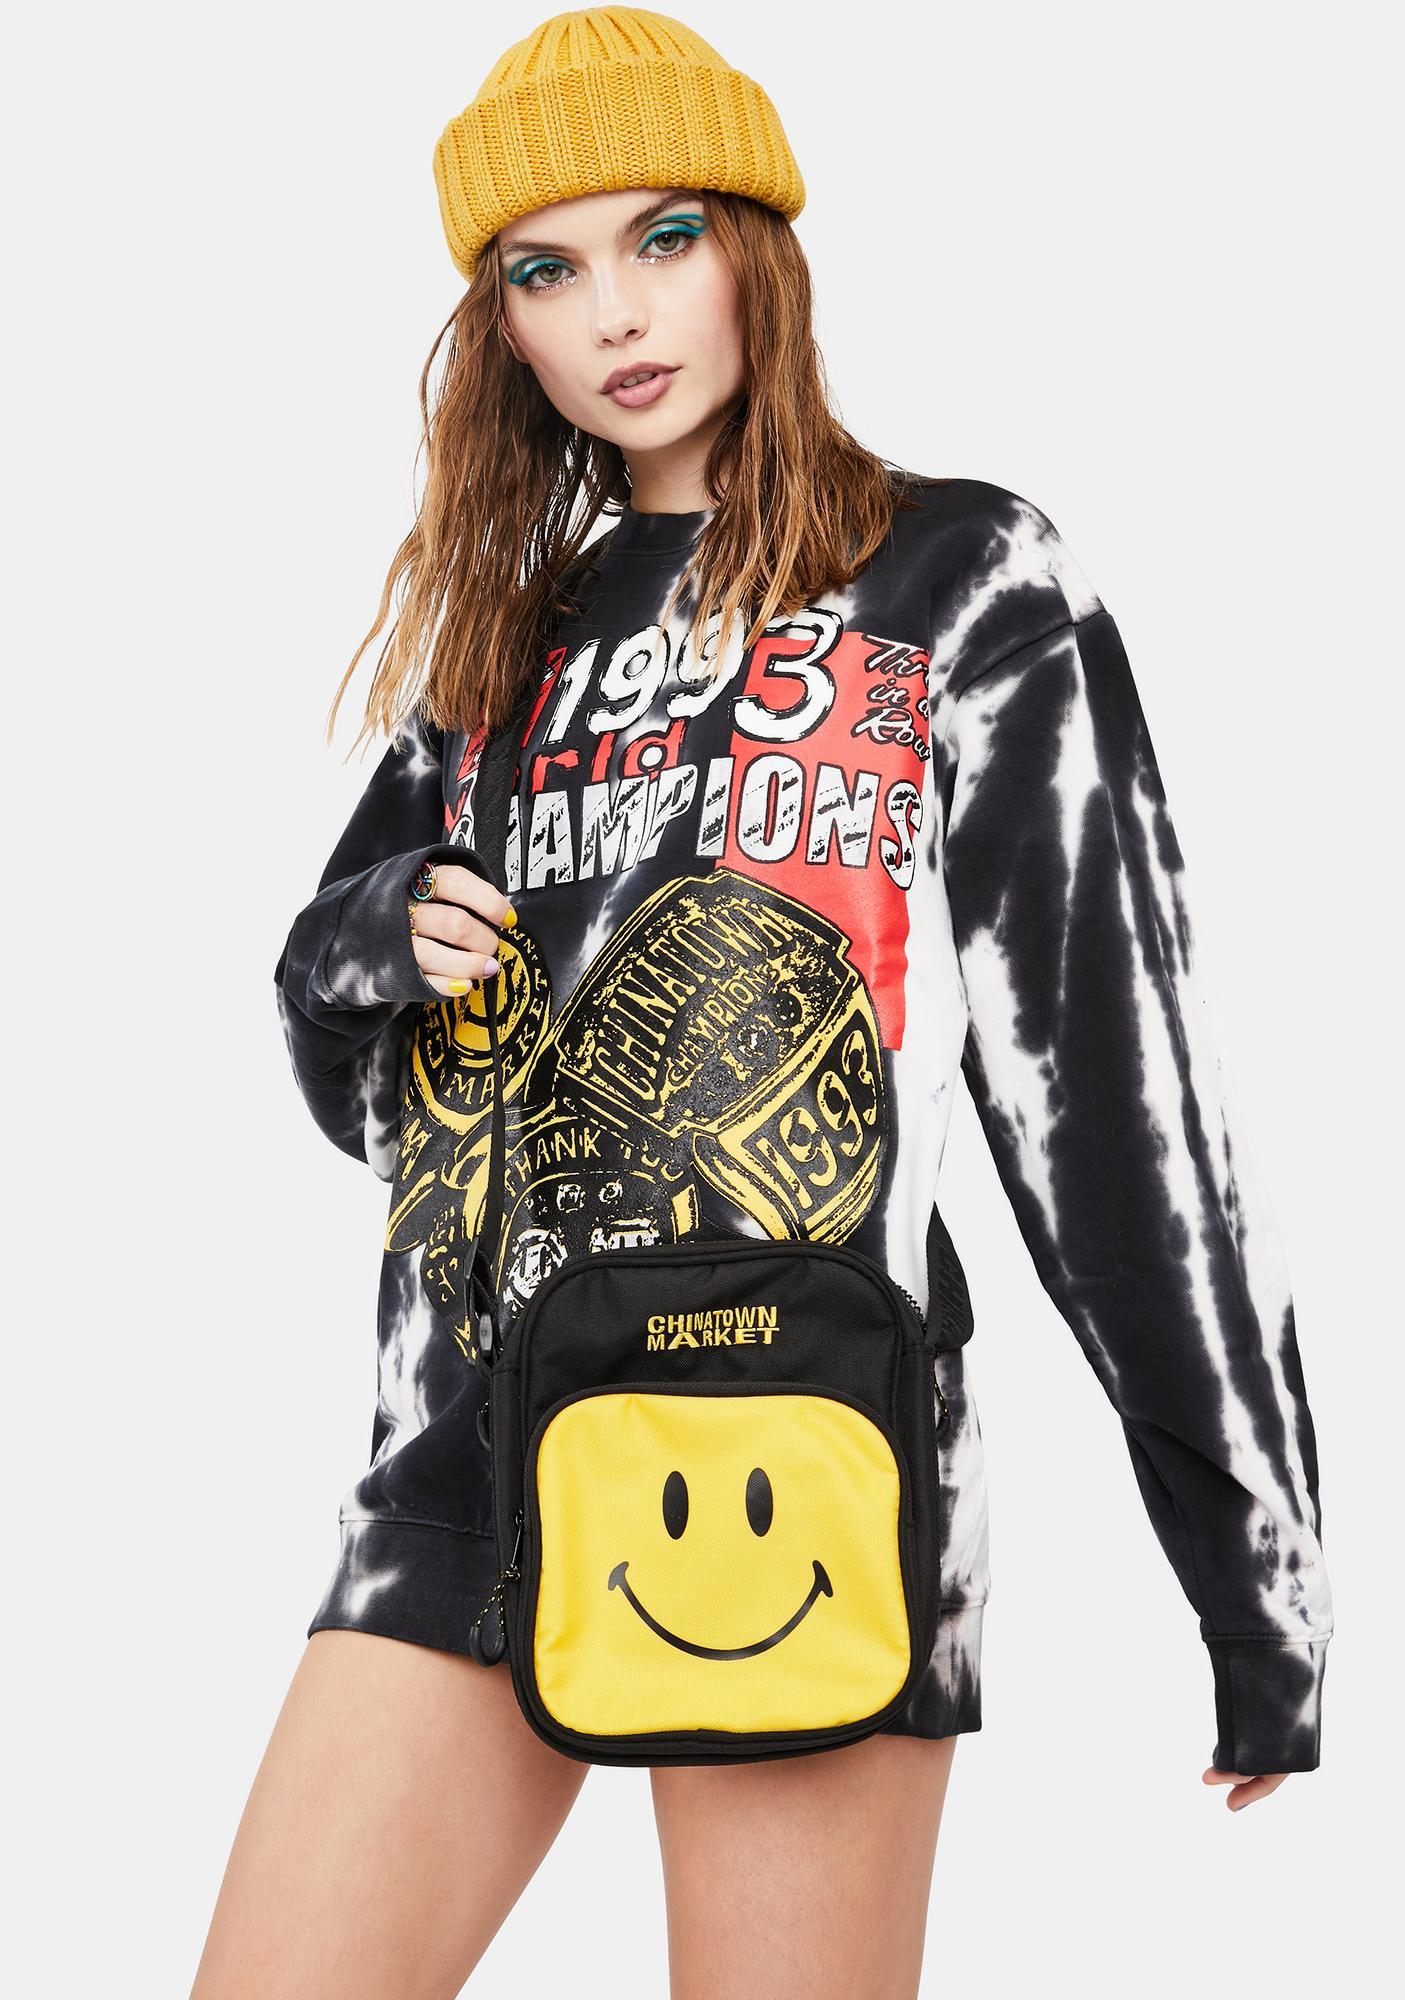 CHINATOWN MARKET Smiley Crossbody Side Bag